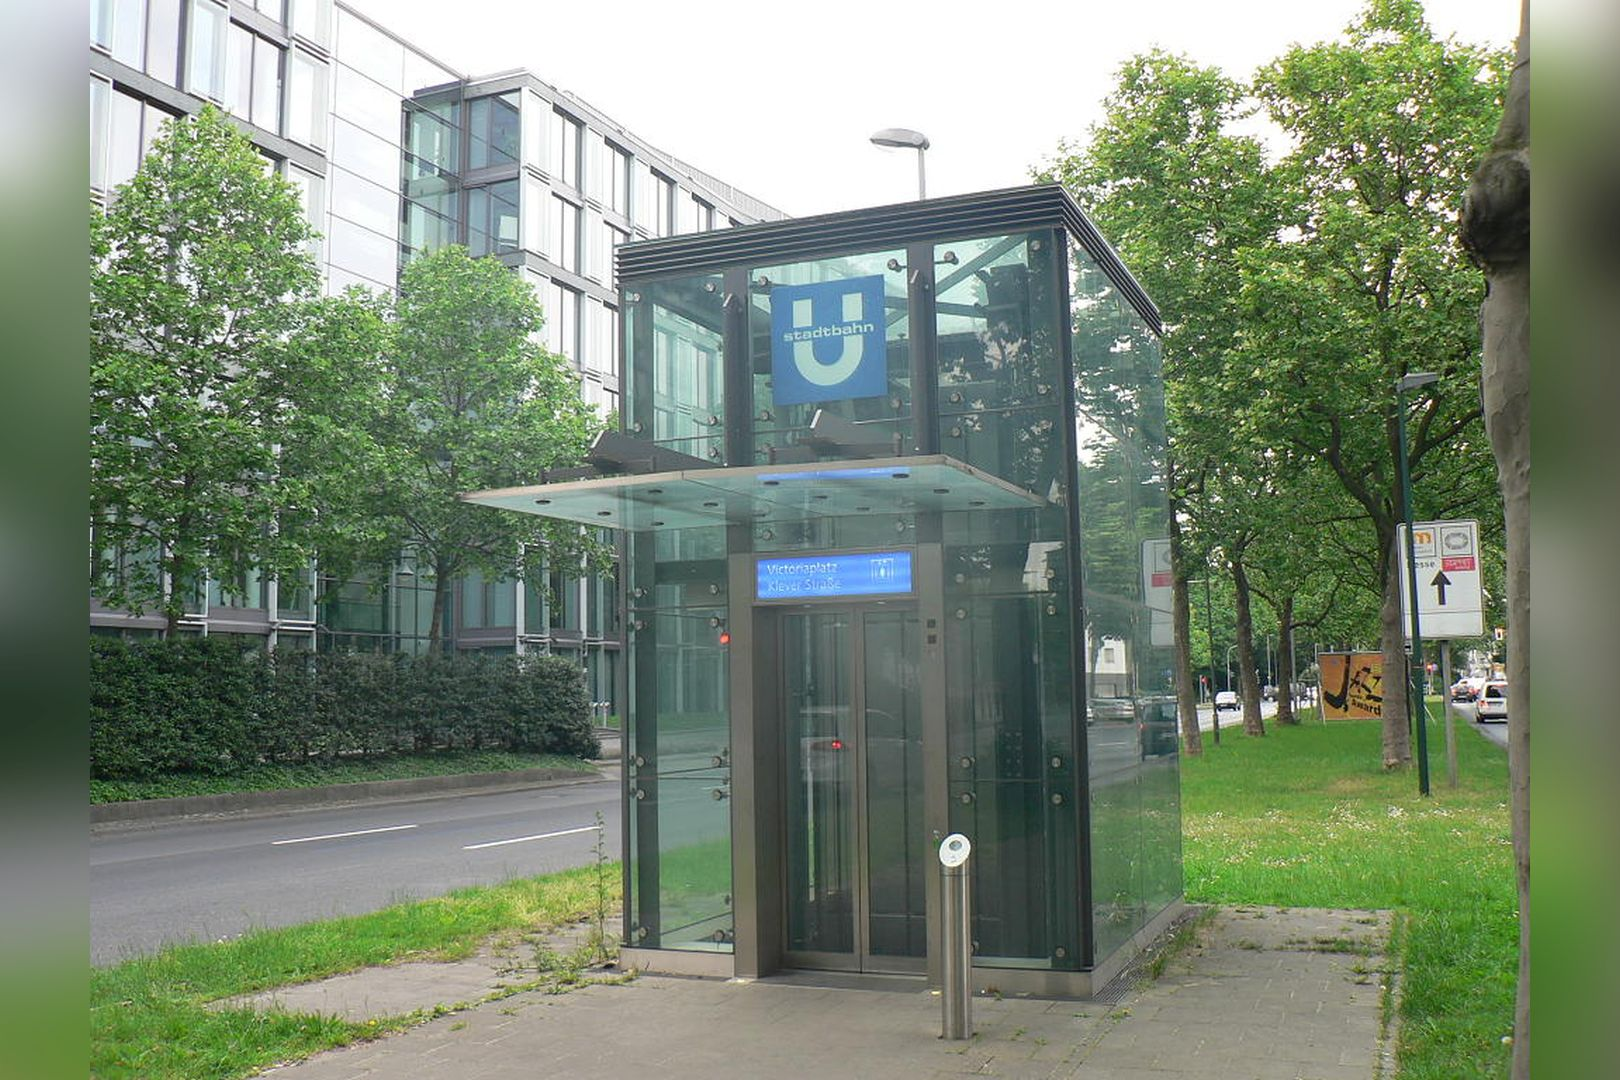 Immobilie Nr.114 - Bürofläche im Altbauobjekt - Bild 4.jpg